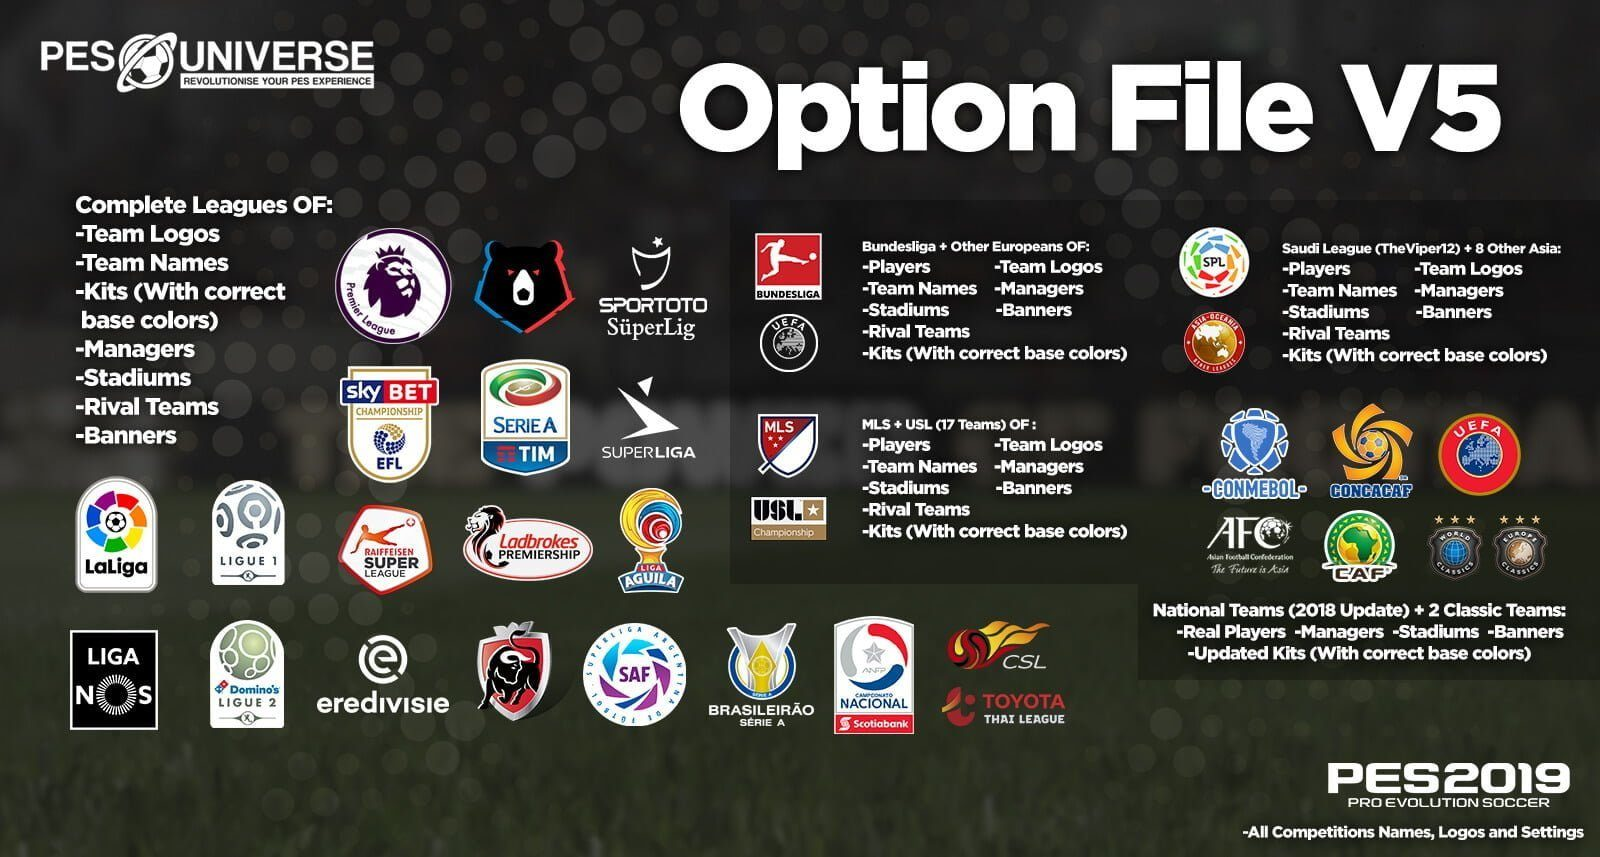 PES 2019 Patch PS4 - Lizenzen, Bundesliga & Anleitung 2